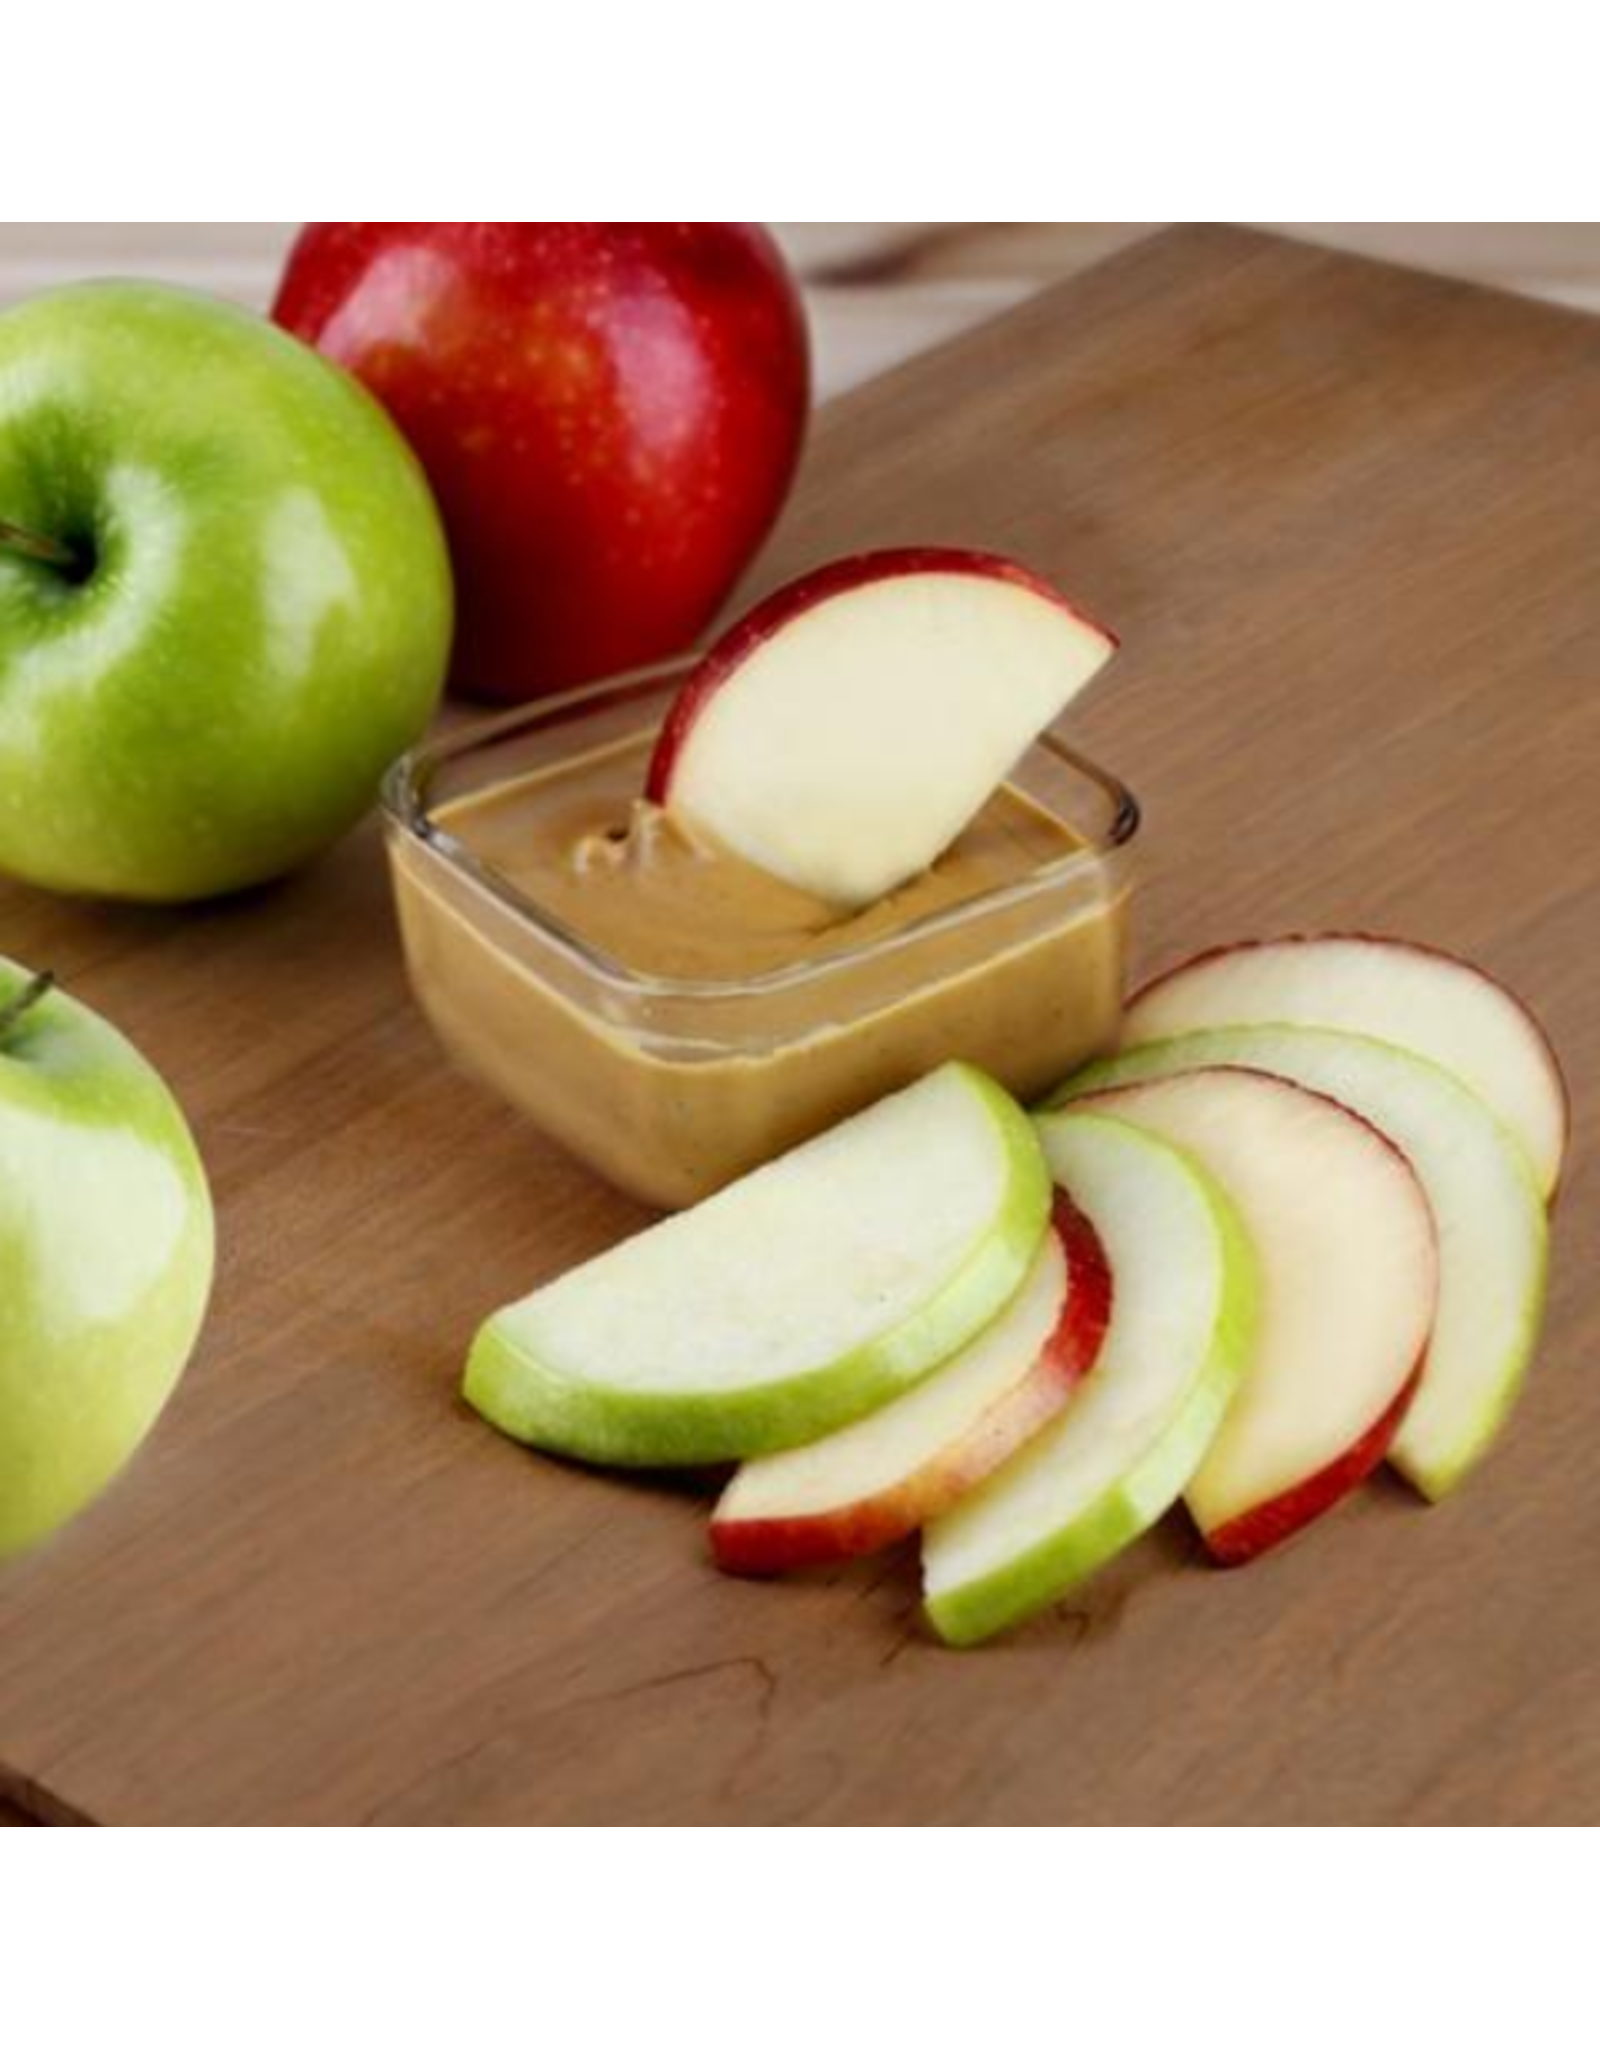 Danesco Apple Slicer PREPARA